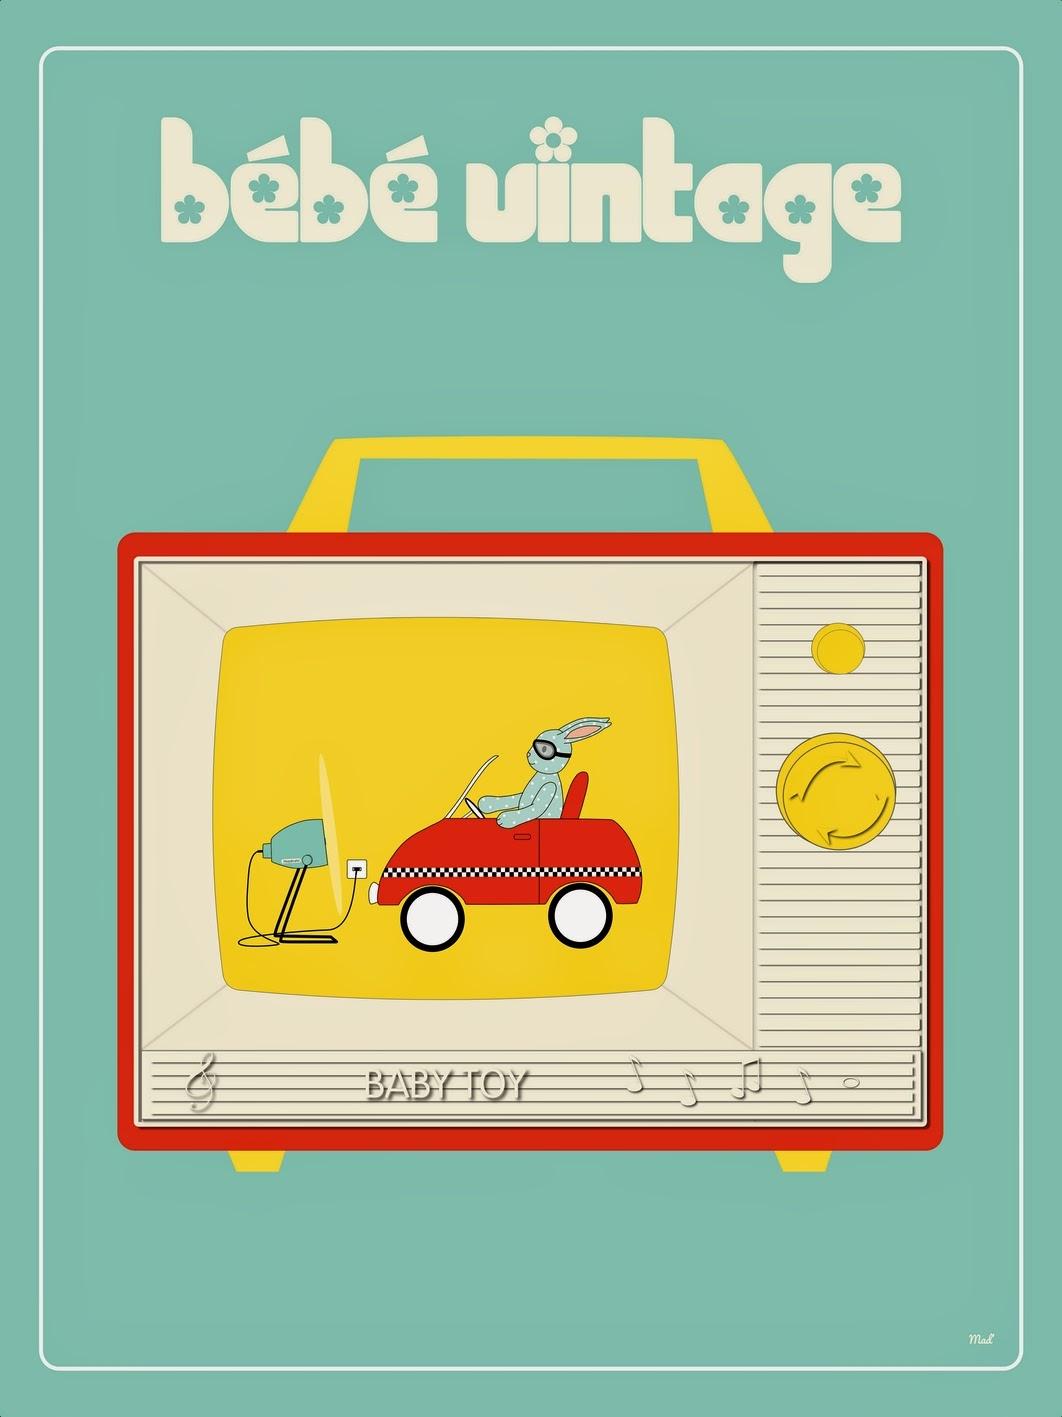 http://dmtmpourledm.canalblog.com/archives/449__affiche_bebe_vintage/index.html